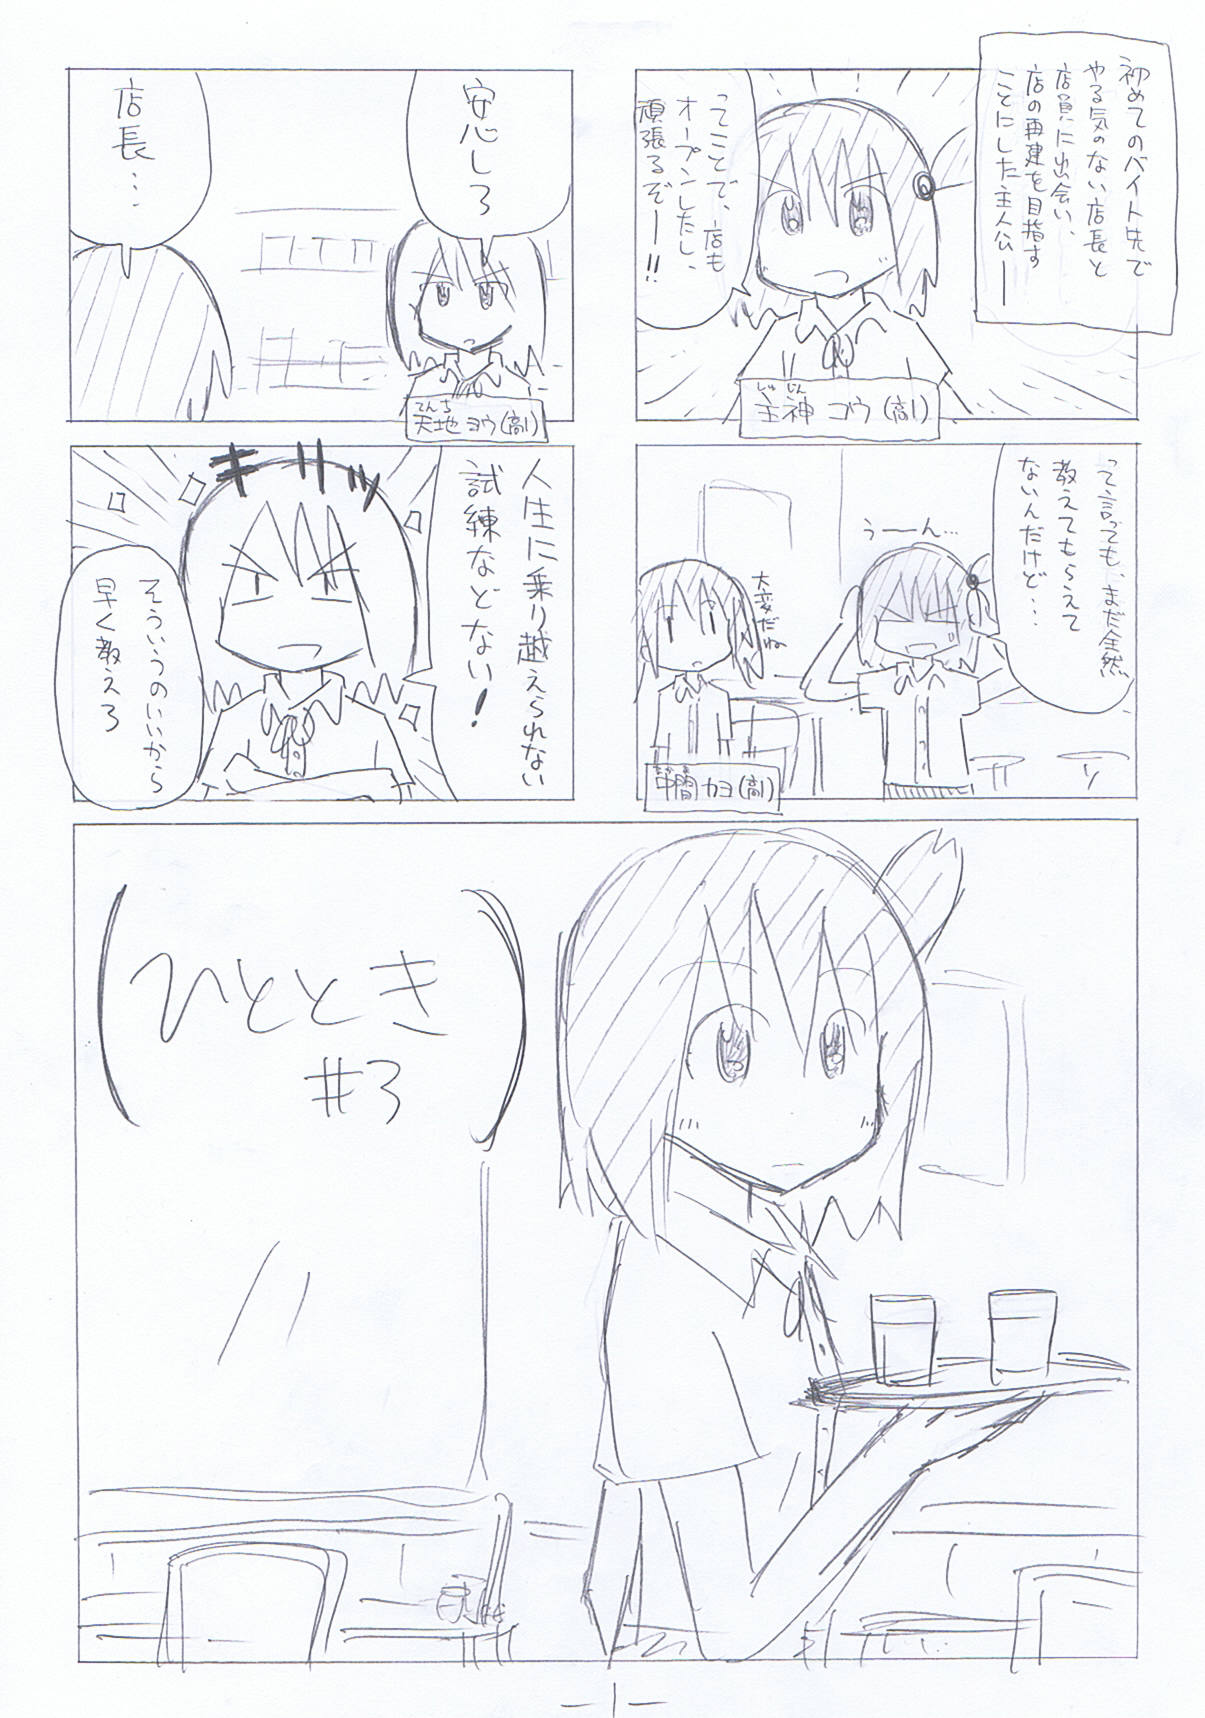 hitotoki-3-1.jpg